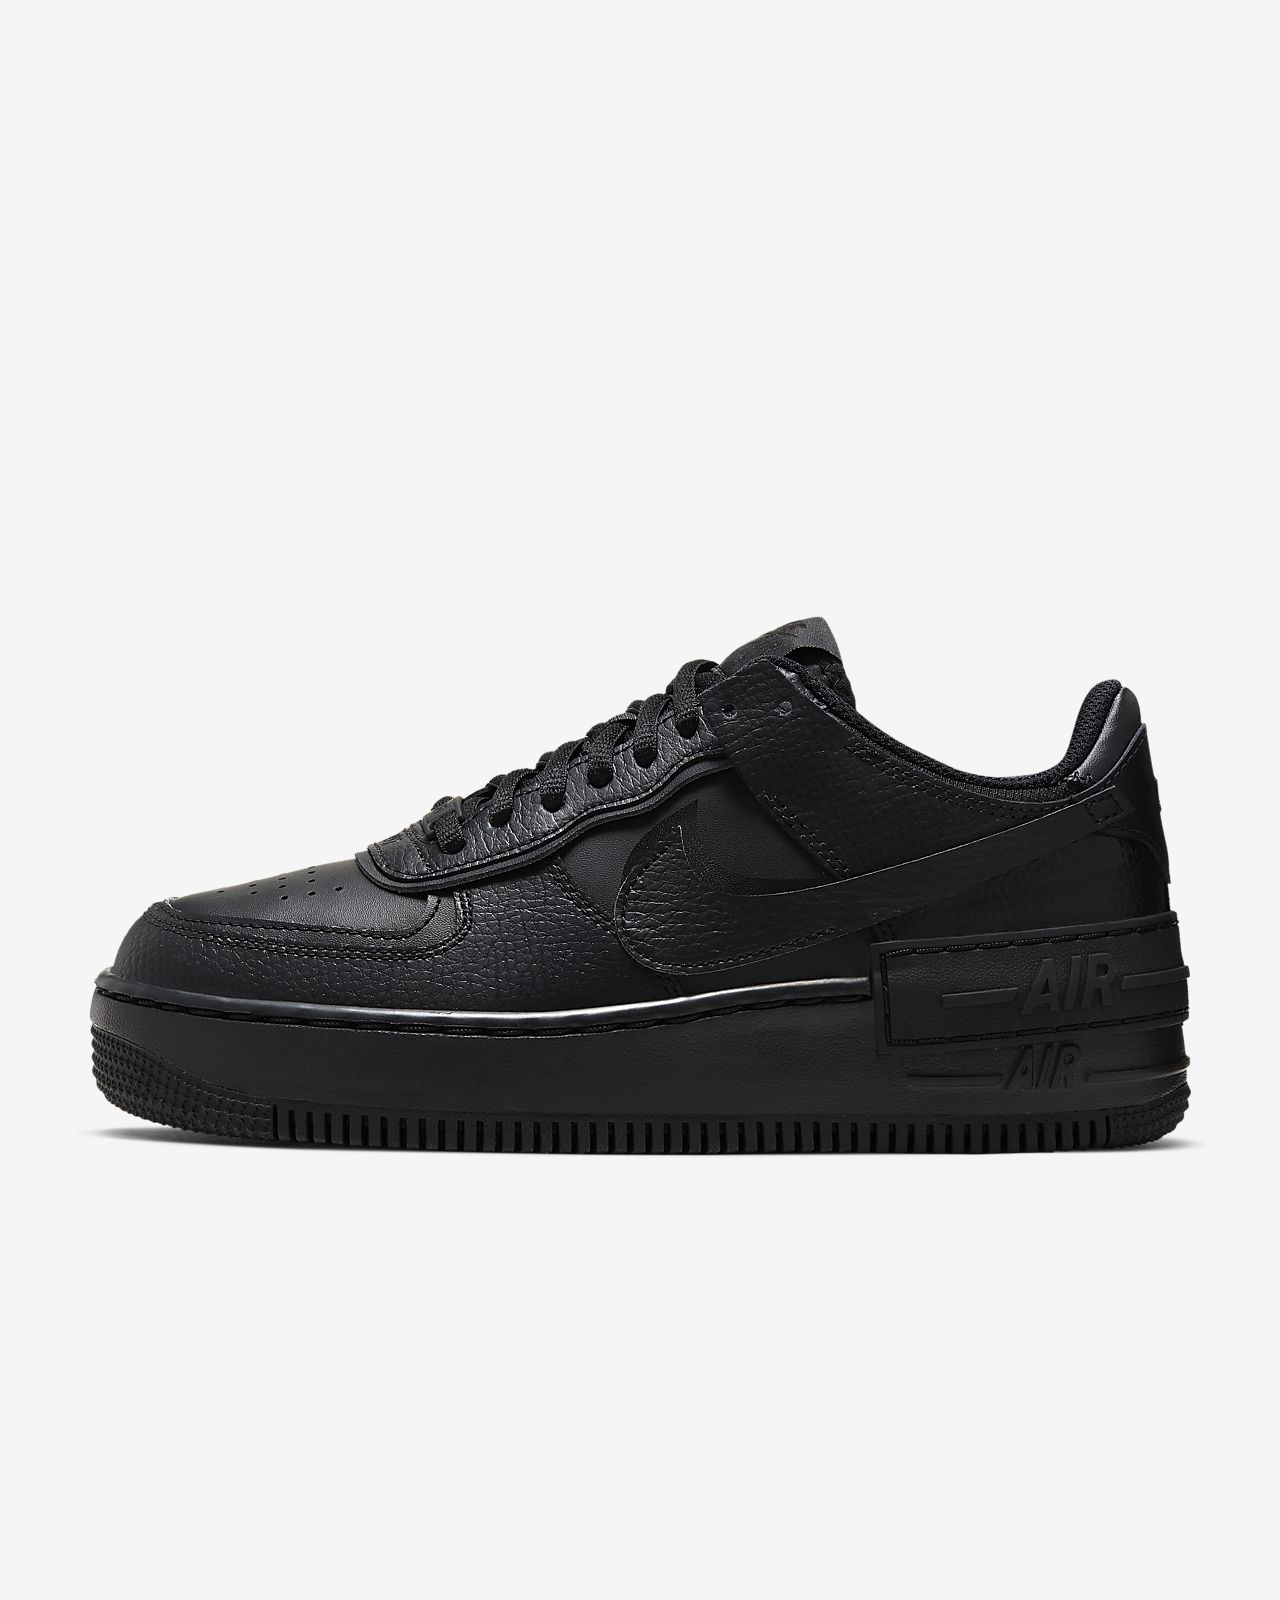 Nike Air Force 1 Low White Black | Nike air force men, Nike